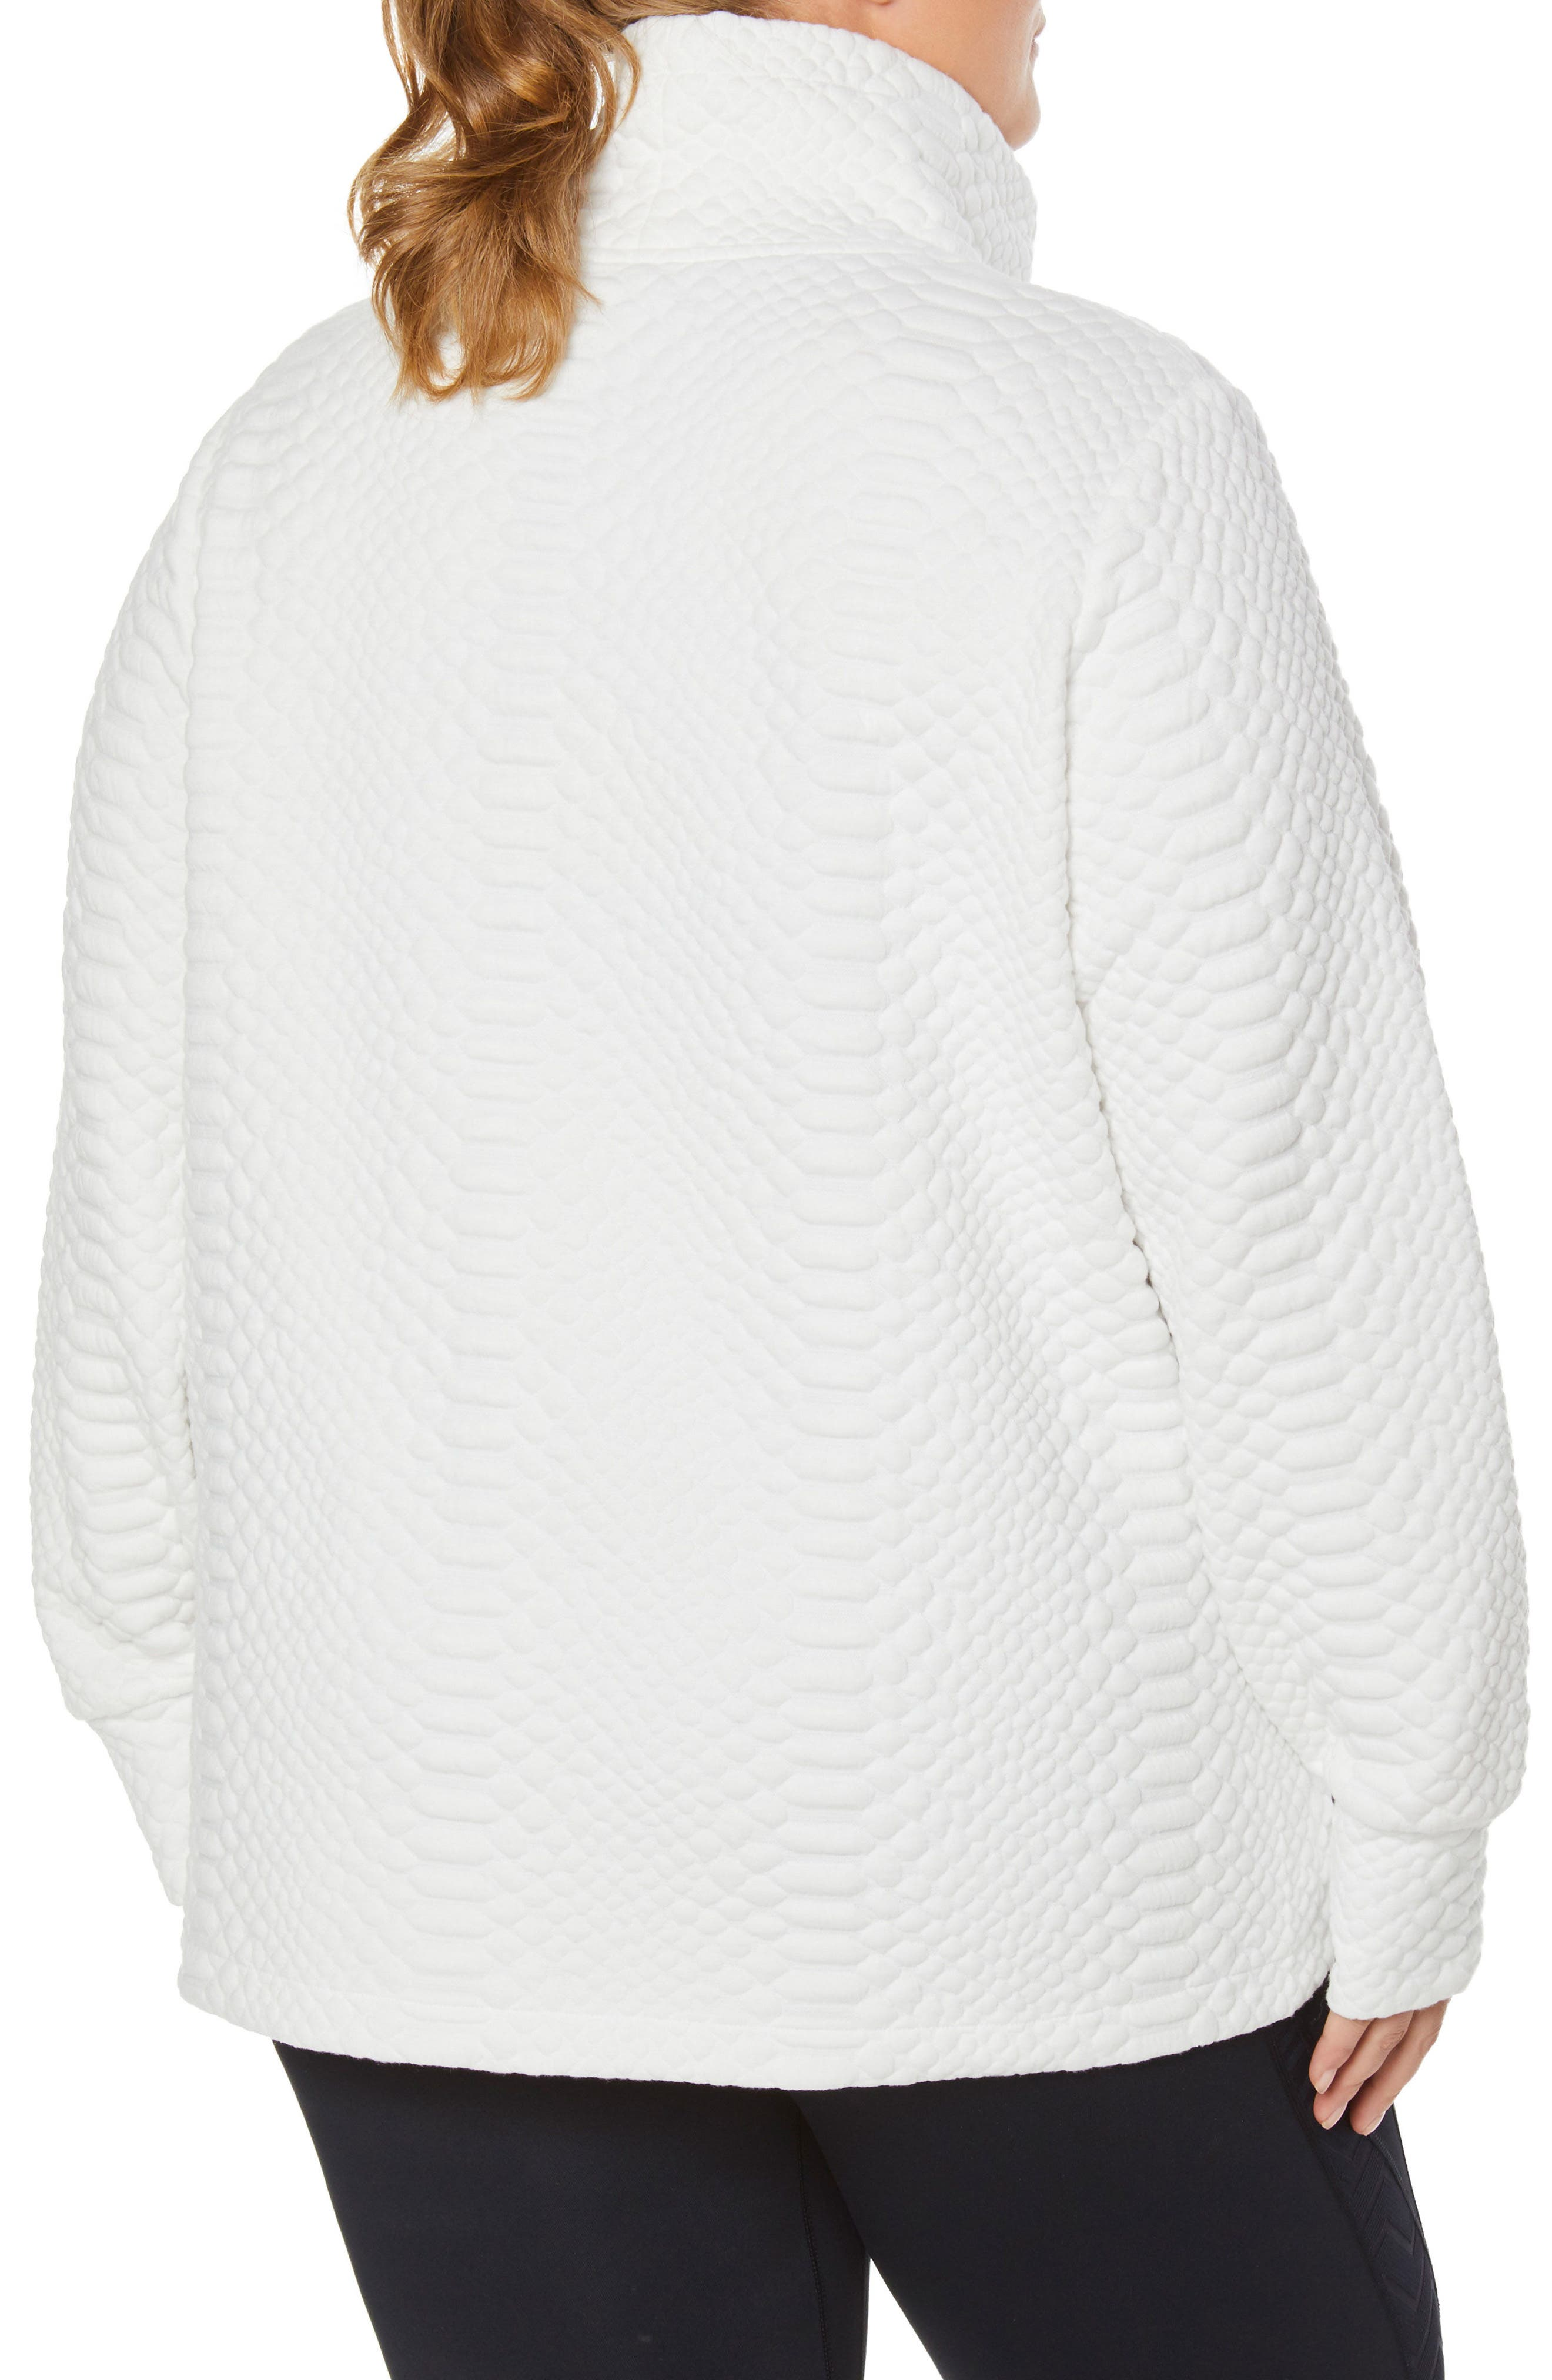 Saturday Mock Neck Pullover,                             Alternate thumbnail 2, color,                             WINTER WHITE